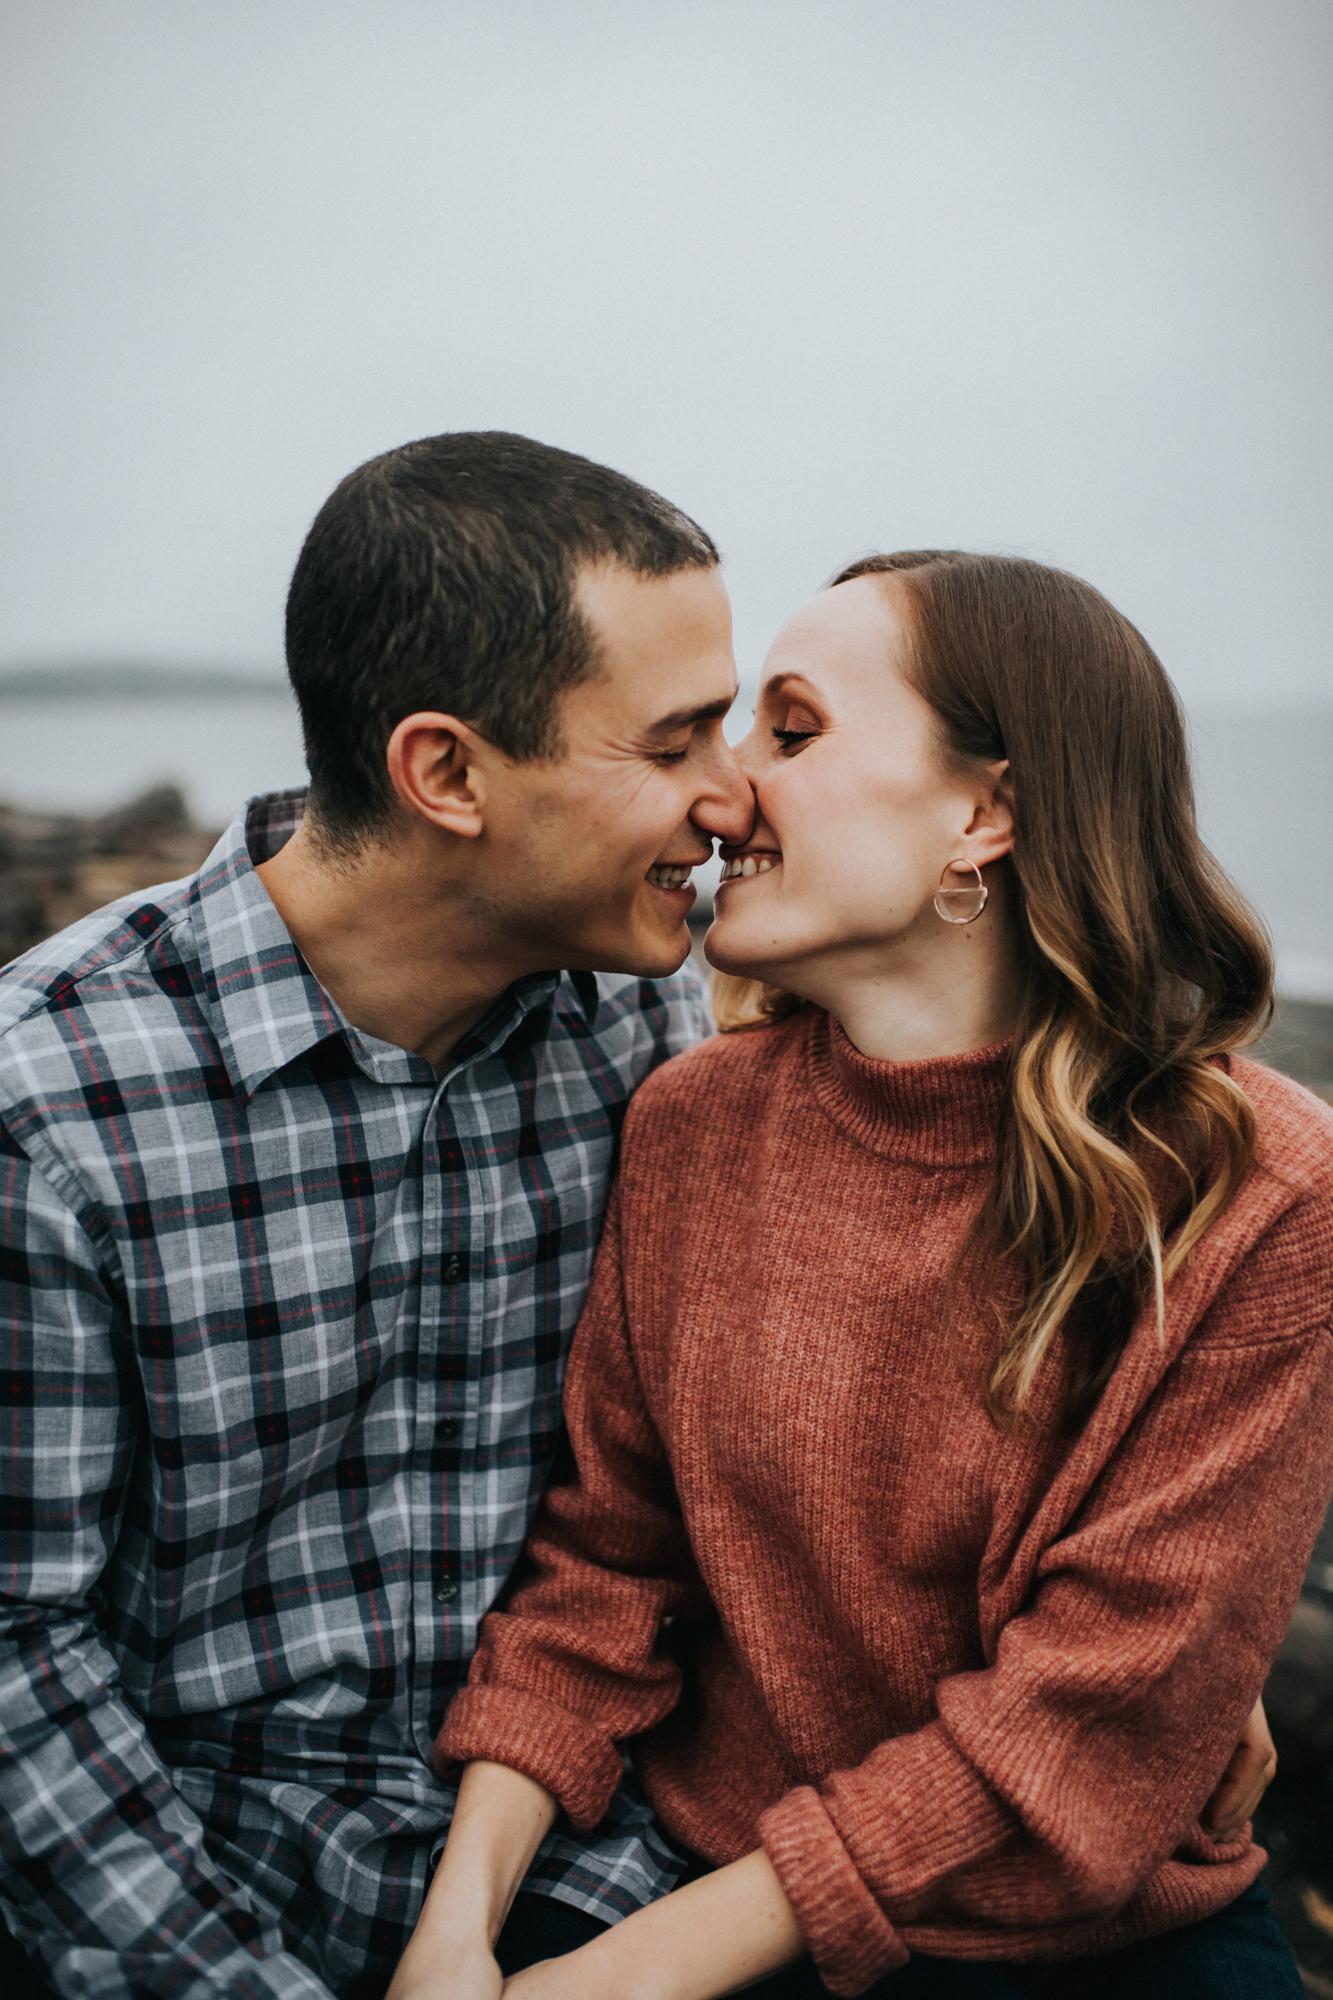 Engagement at Fay Bainbridge Park on Bainbridge Island WA | Nicole & Max